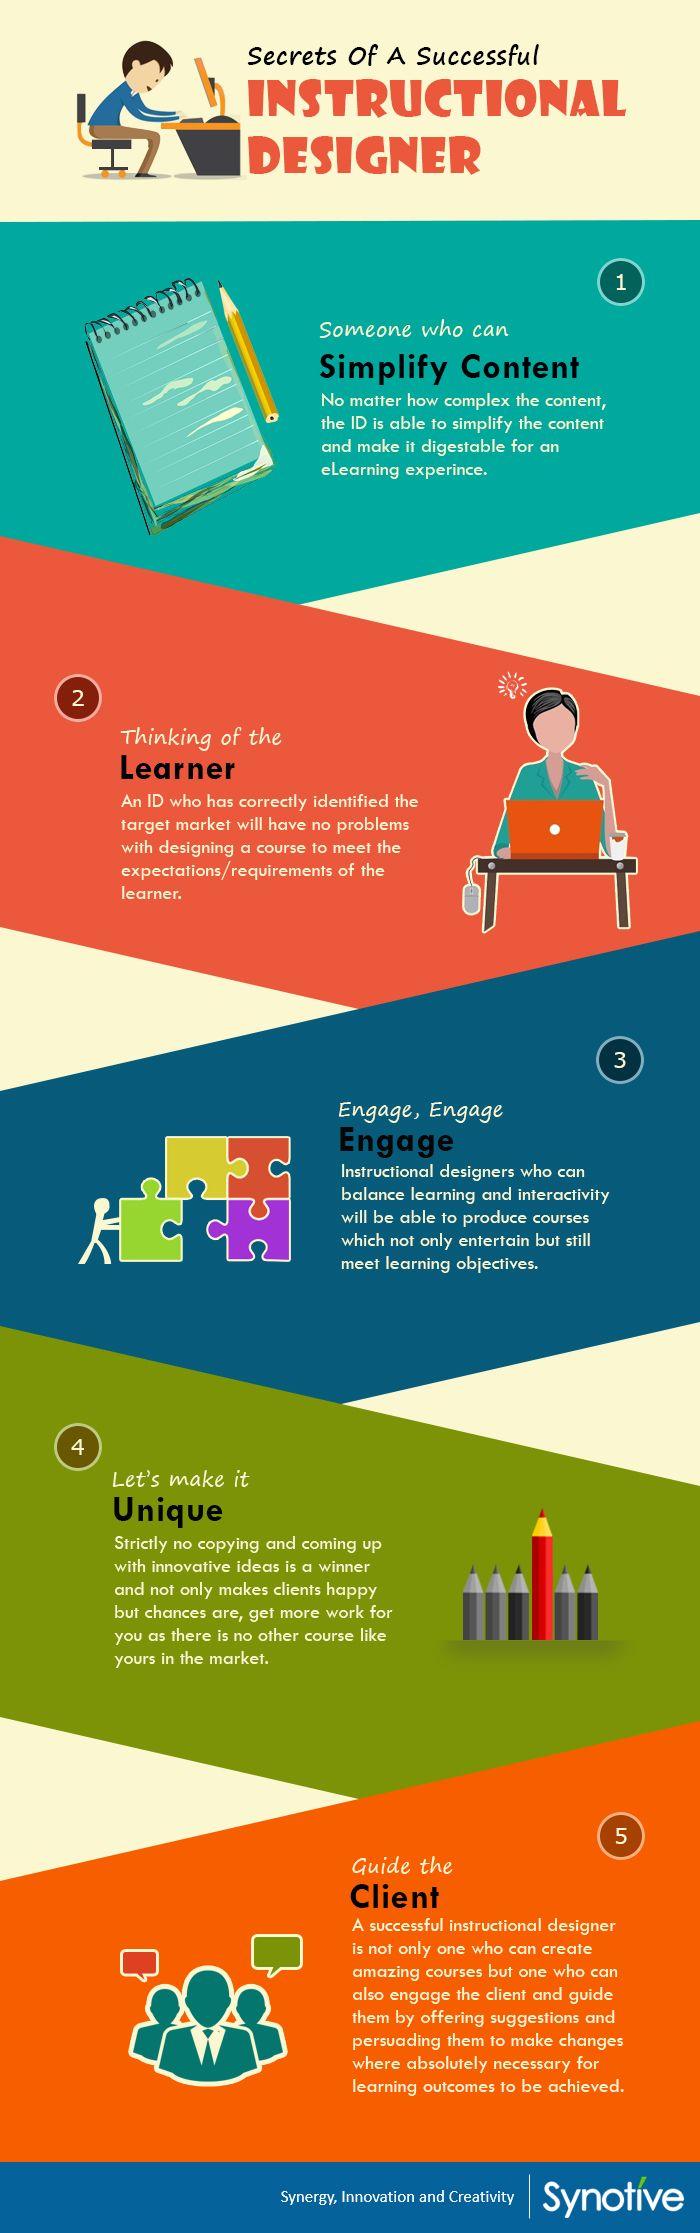 The Secrets of a Successful Instructional Designer